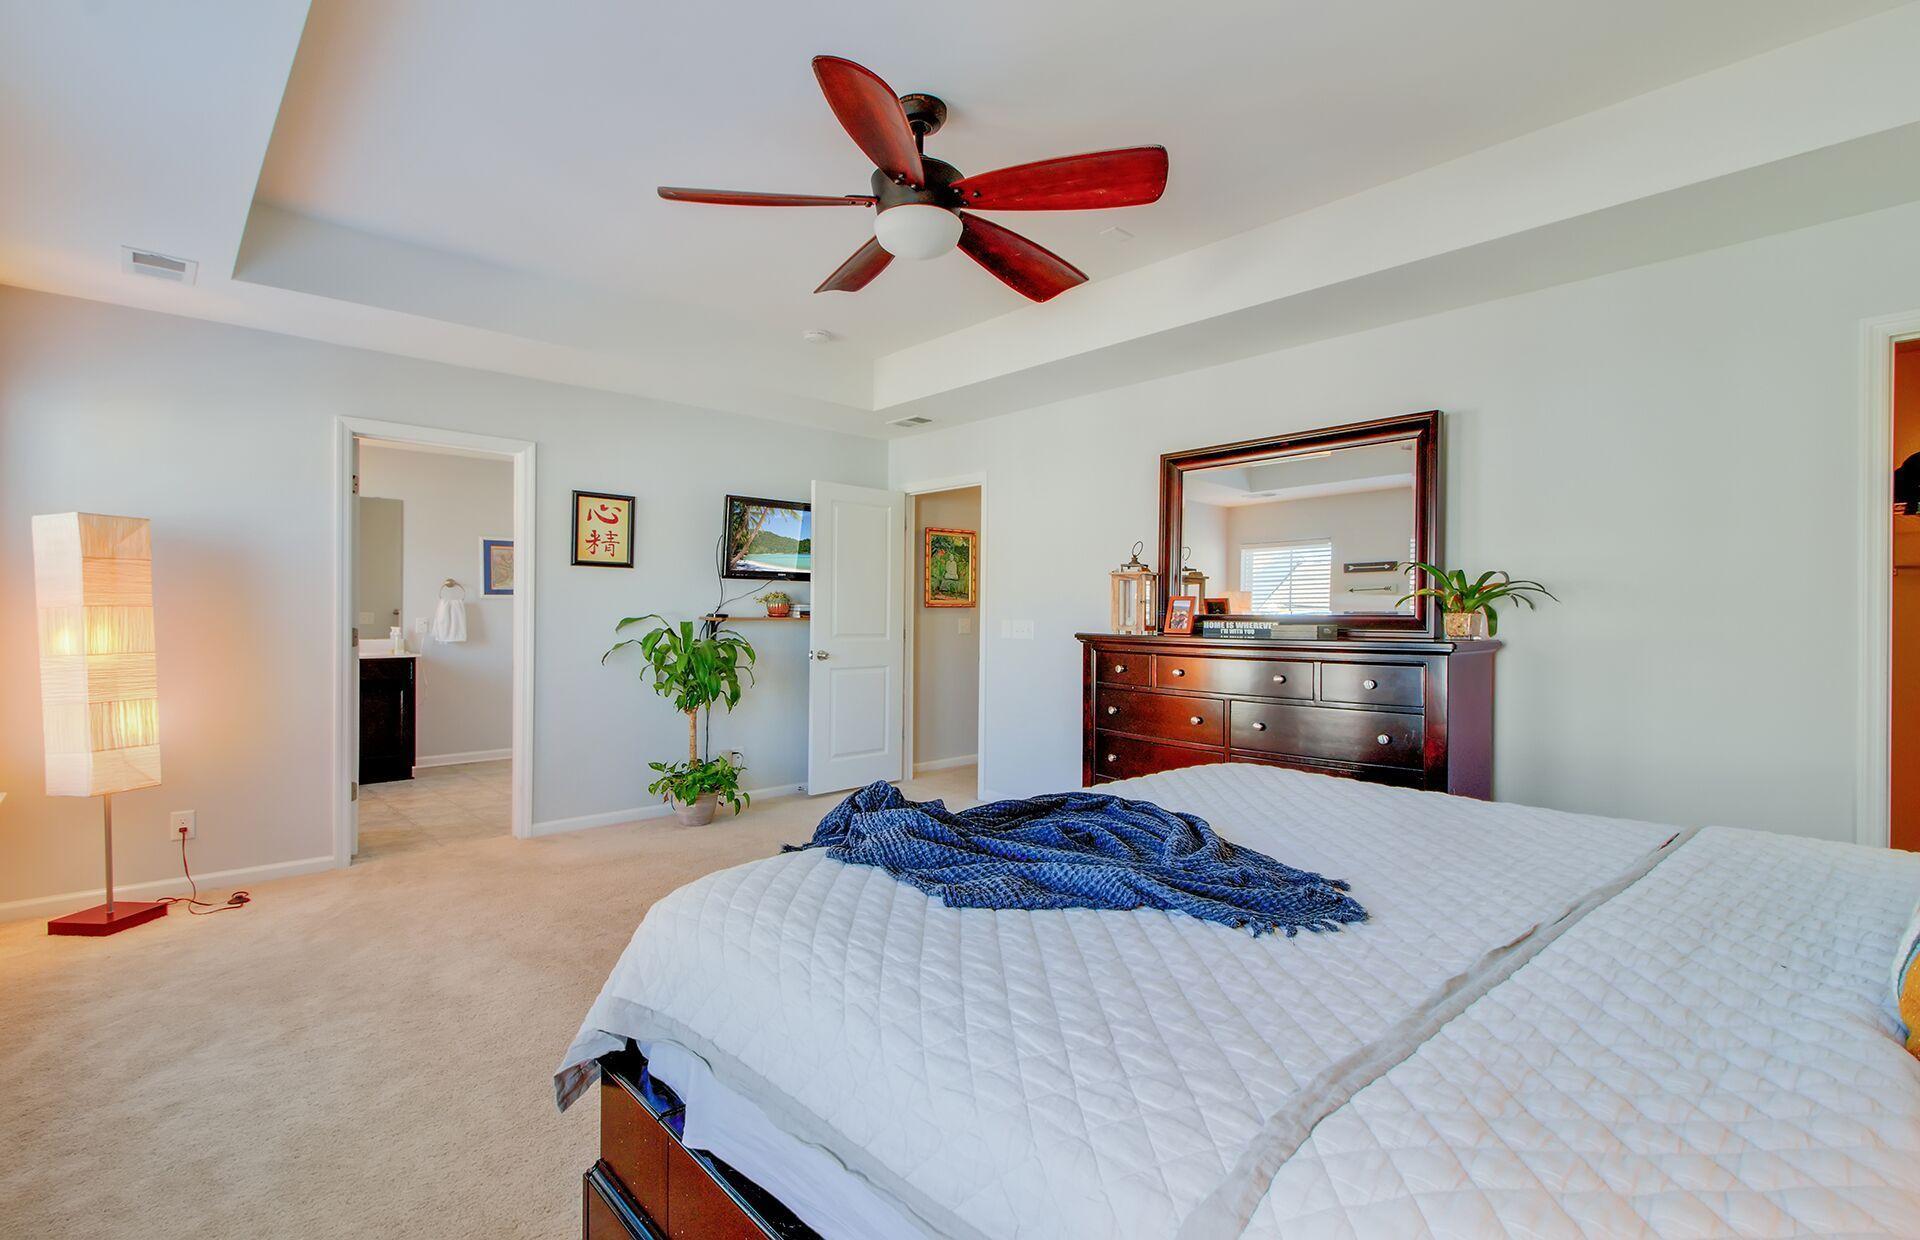 Oak Terrace Preserve Homes For Sale - 4967 Liberty Park, North Charleston, SC - 19